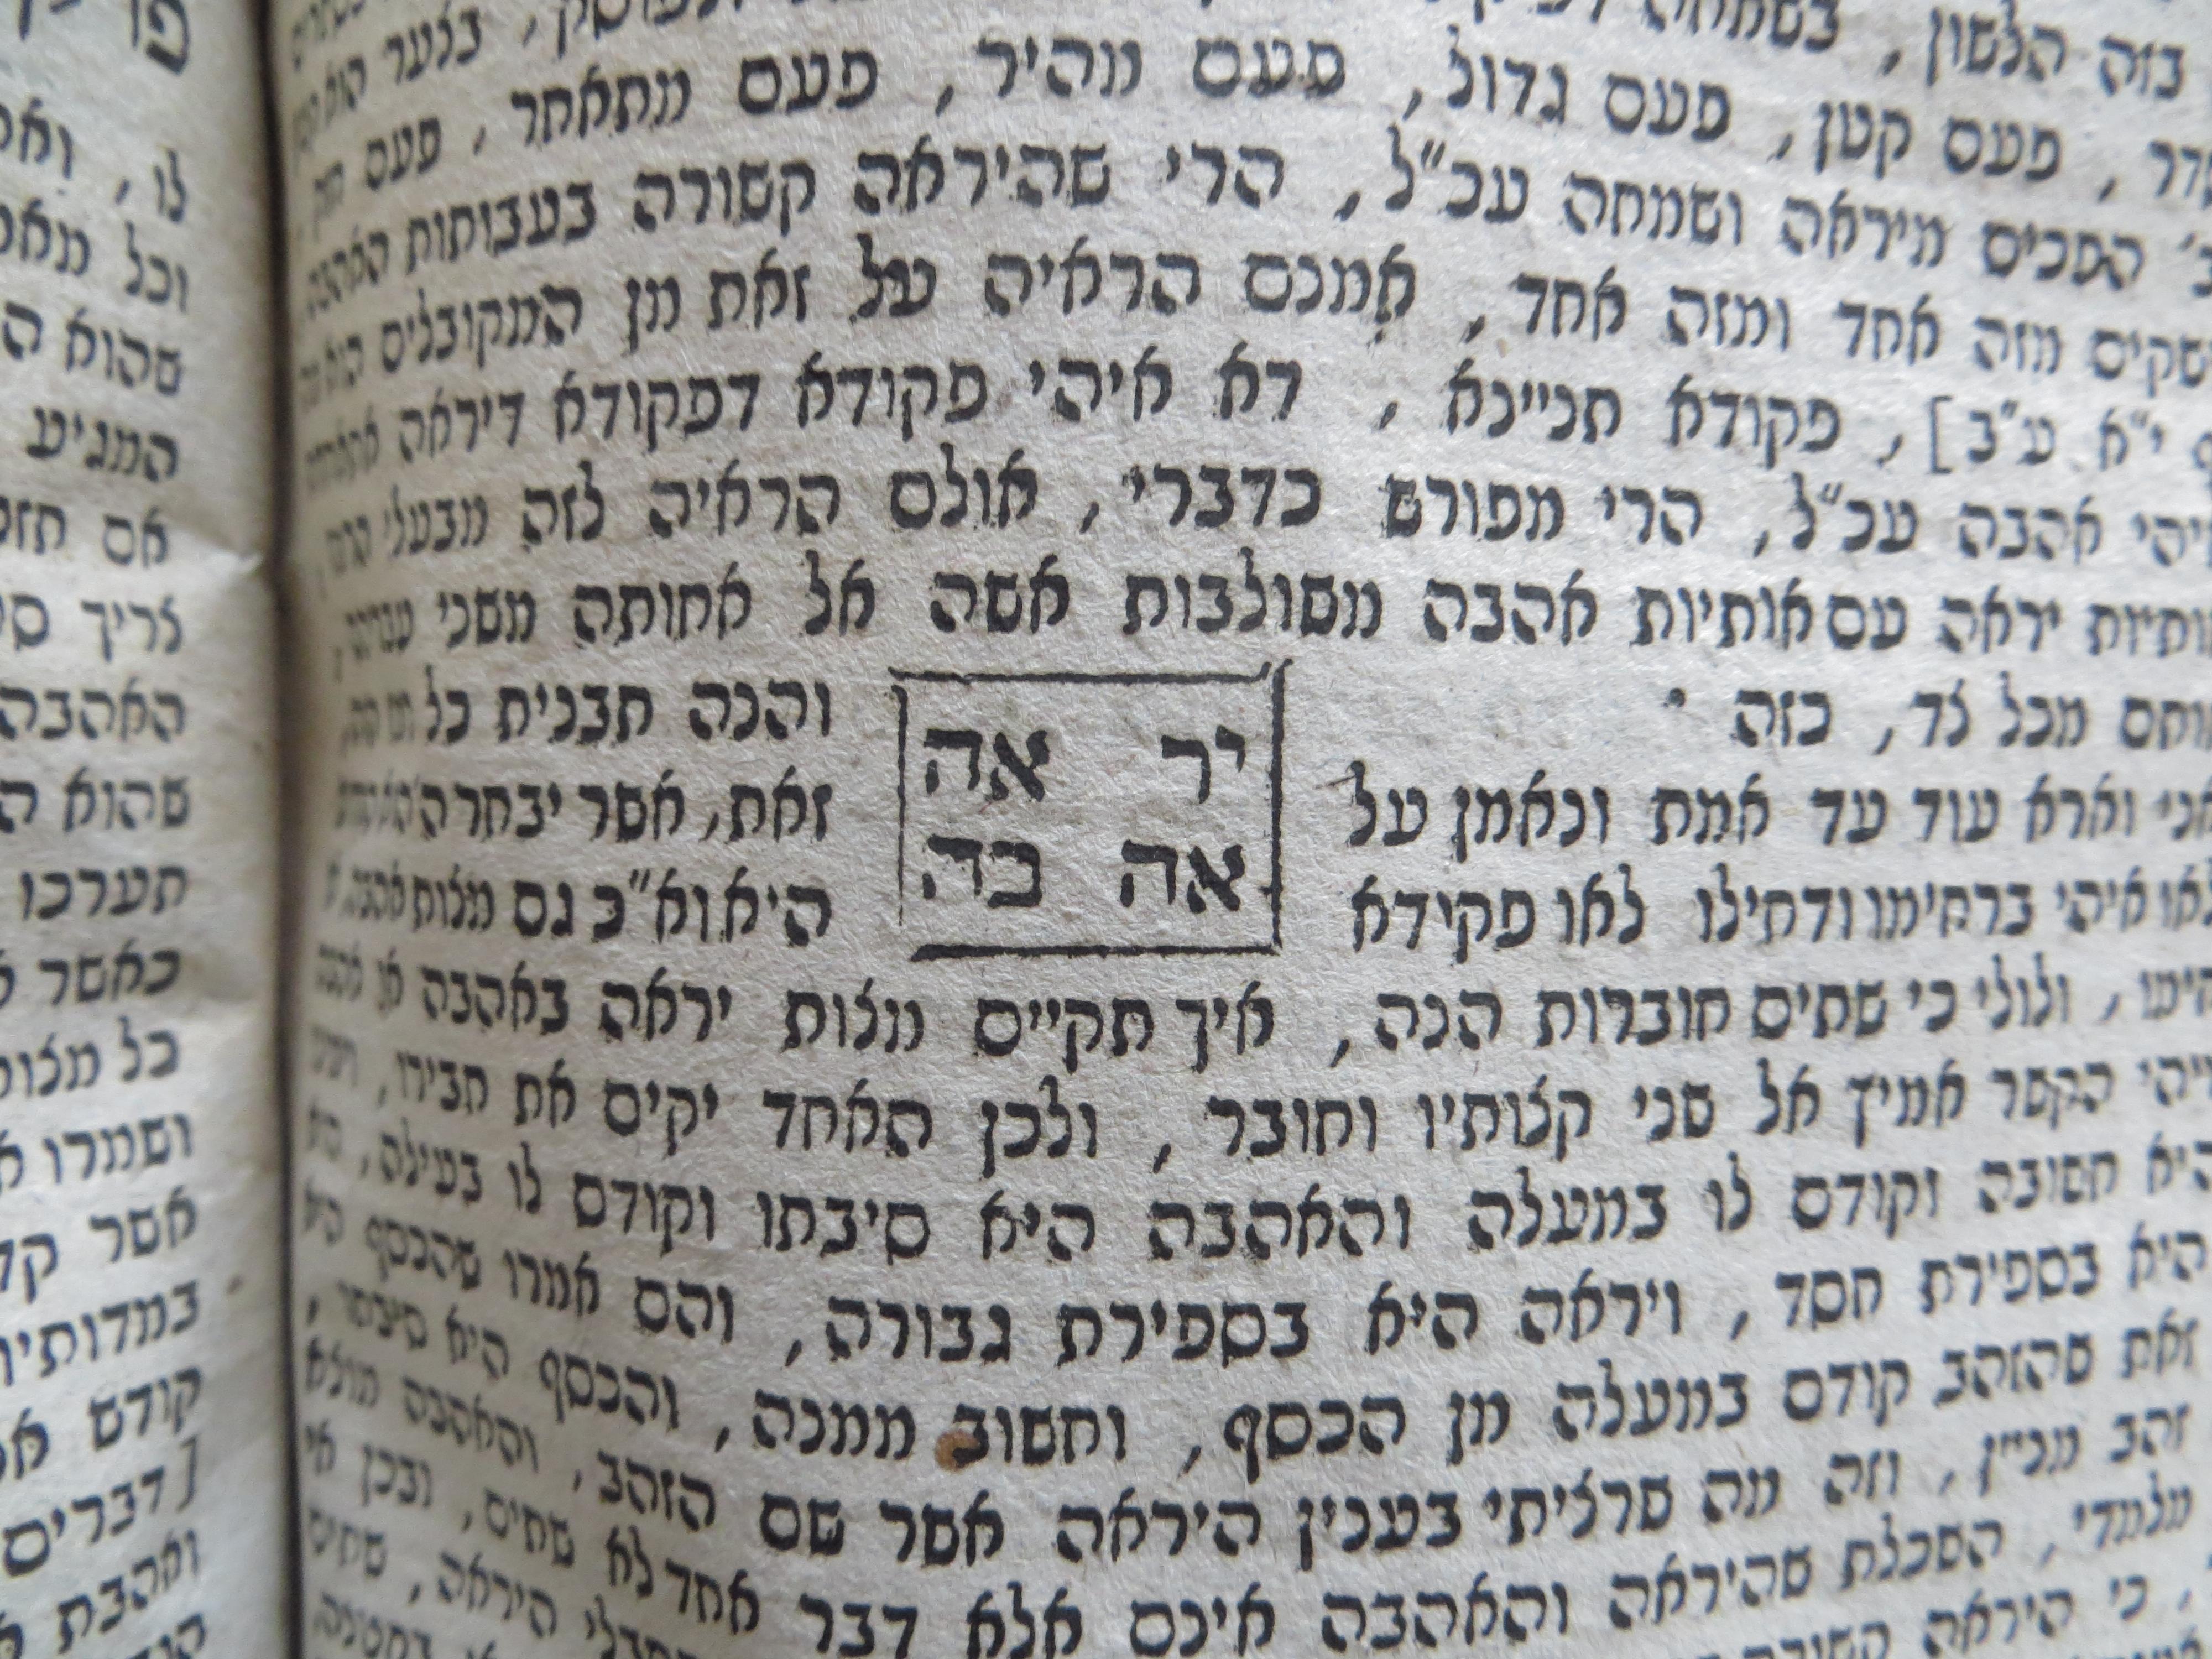 [HOROVITZ, Phinehas Elijah b. Meir]